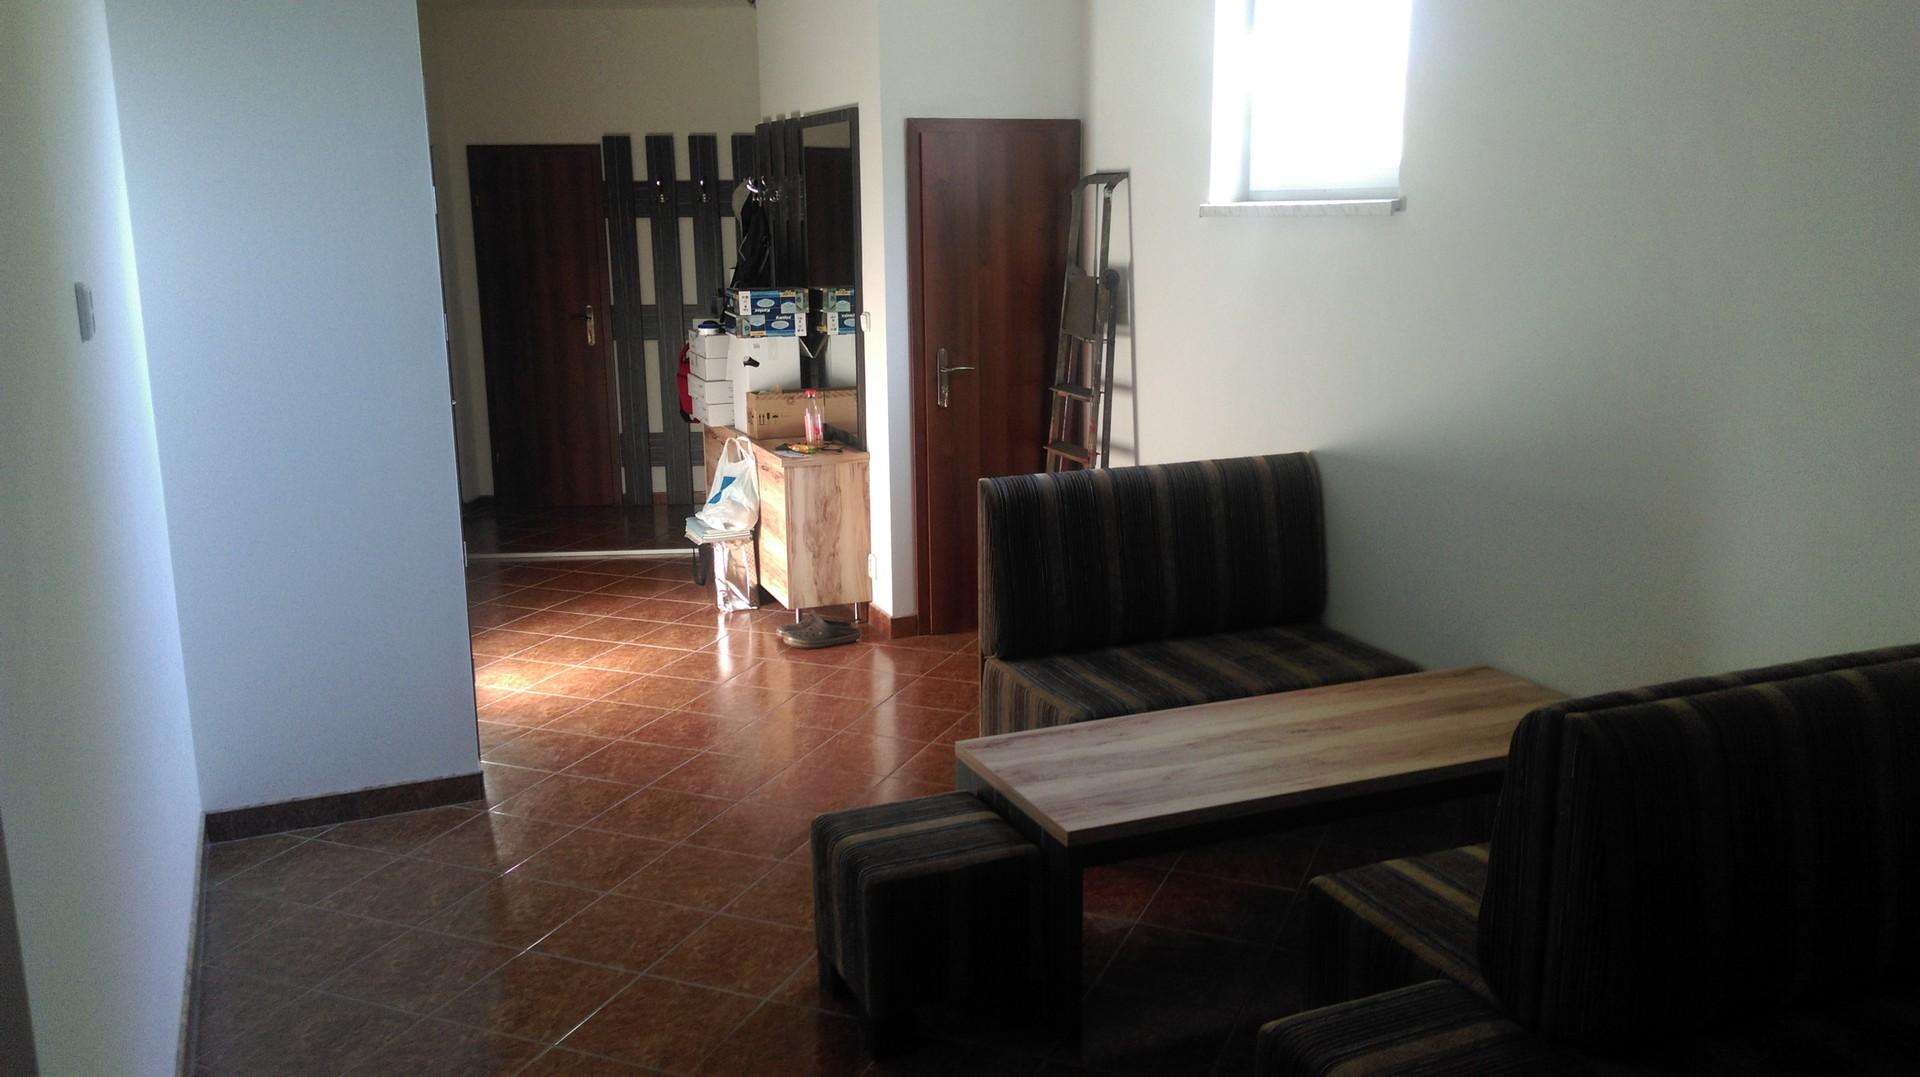 free-rooms-shared-apartment-05b7cd48c7f5dc743ef07068fda3550b